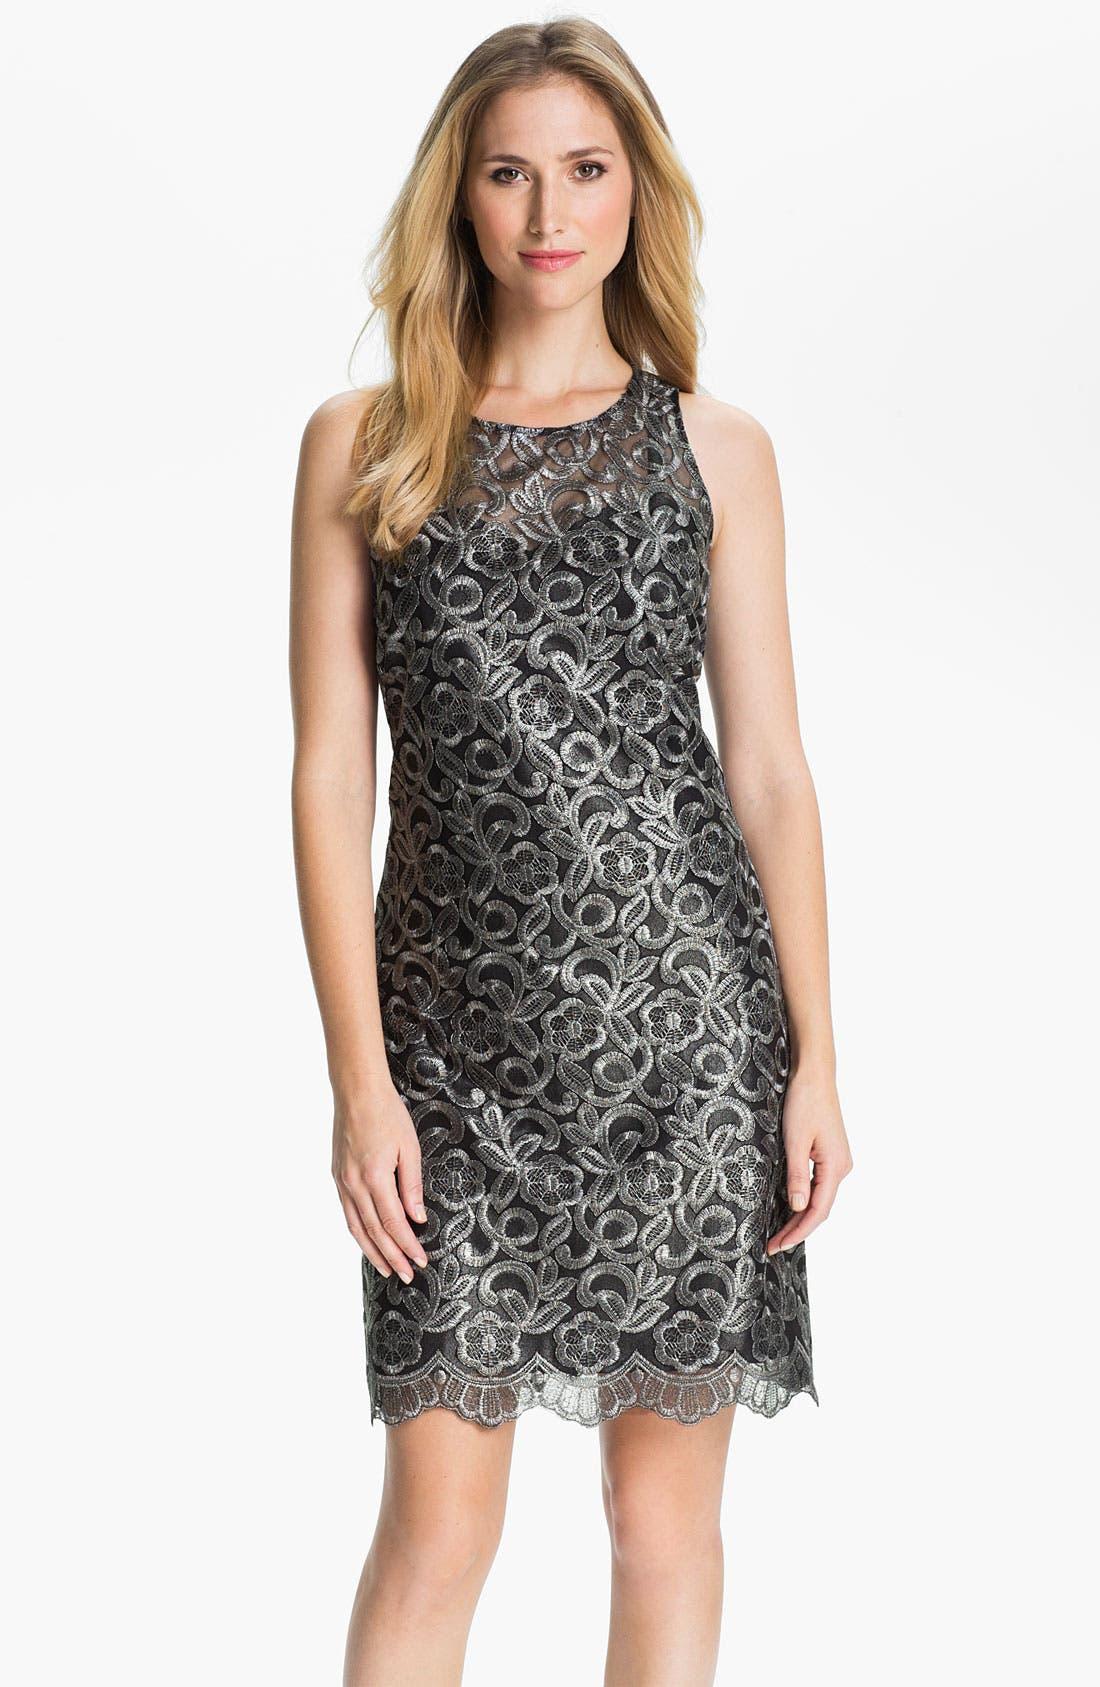 Alternate Image 1 Selected - Donna Ricco Metallic Embroidered Sheath Dress